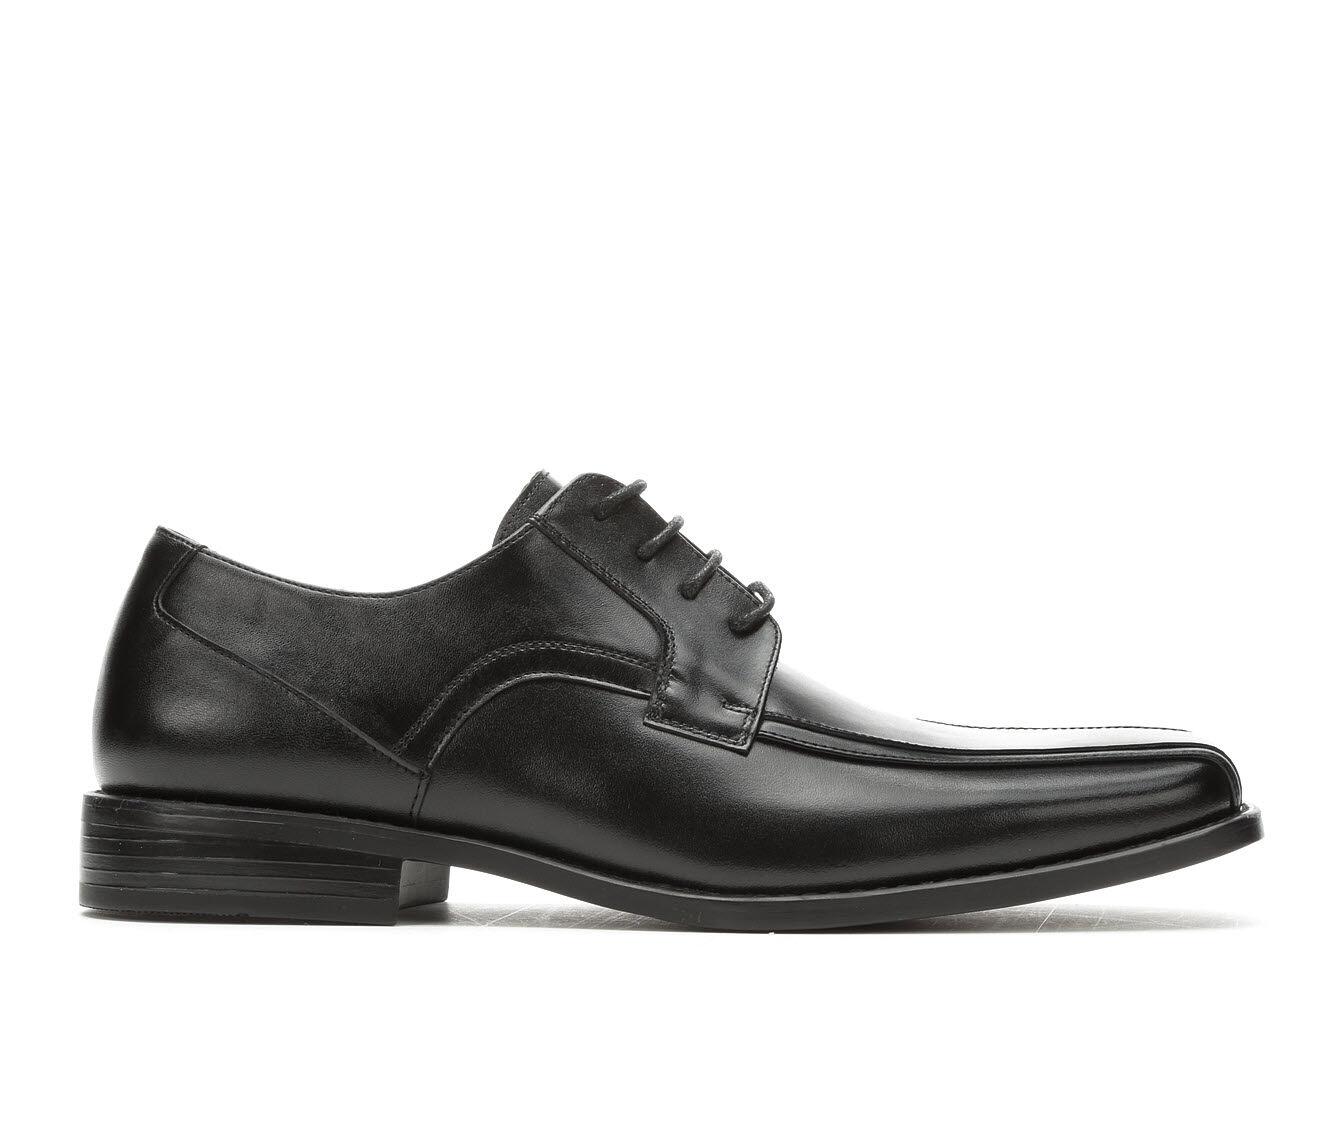 Men's Stacy Adams Corrado II Dress Shoes Black